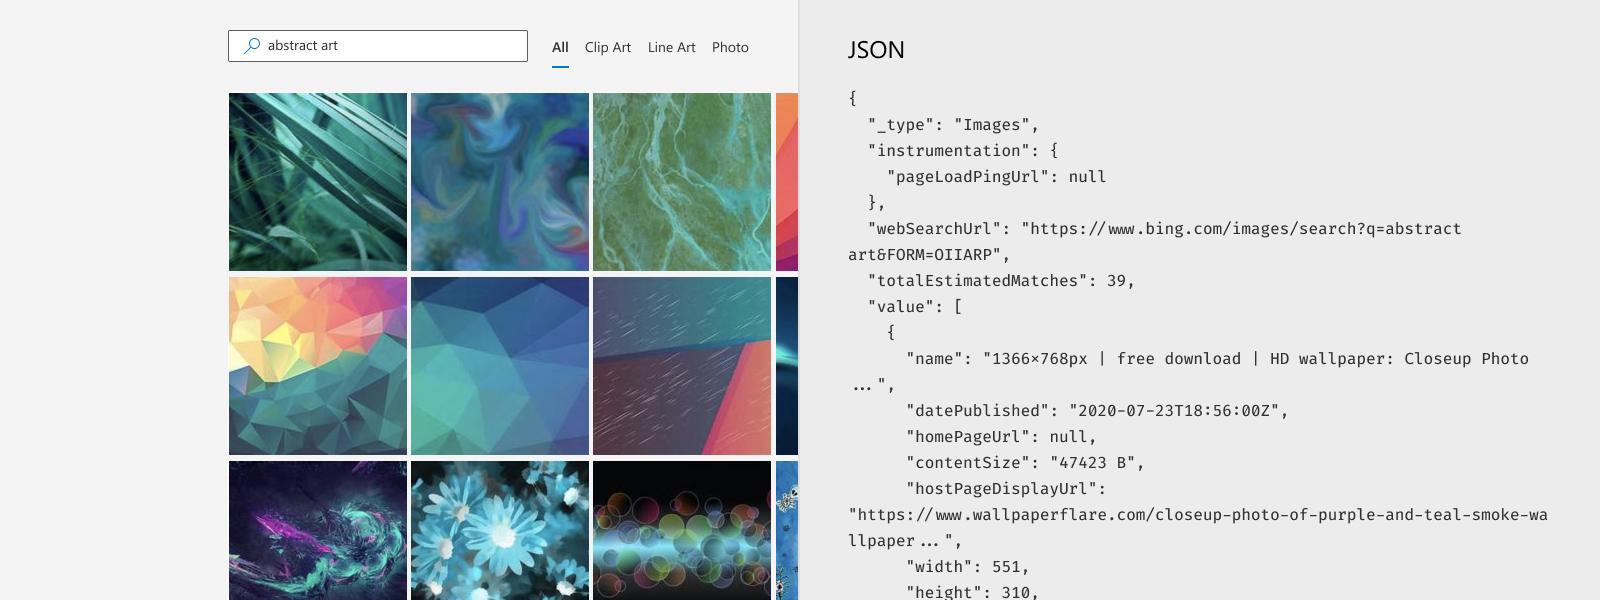 Illustration of representative JSON response for Bing Image Search API.